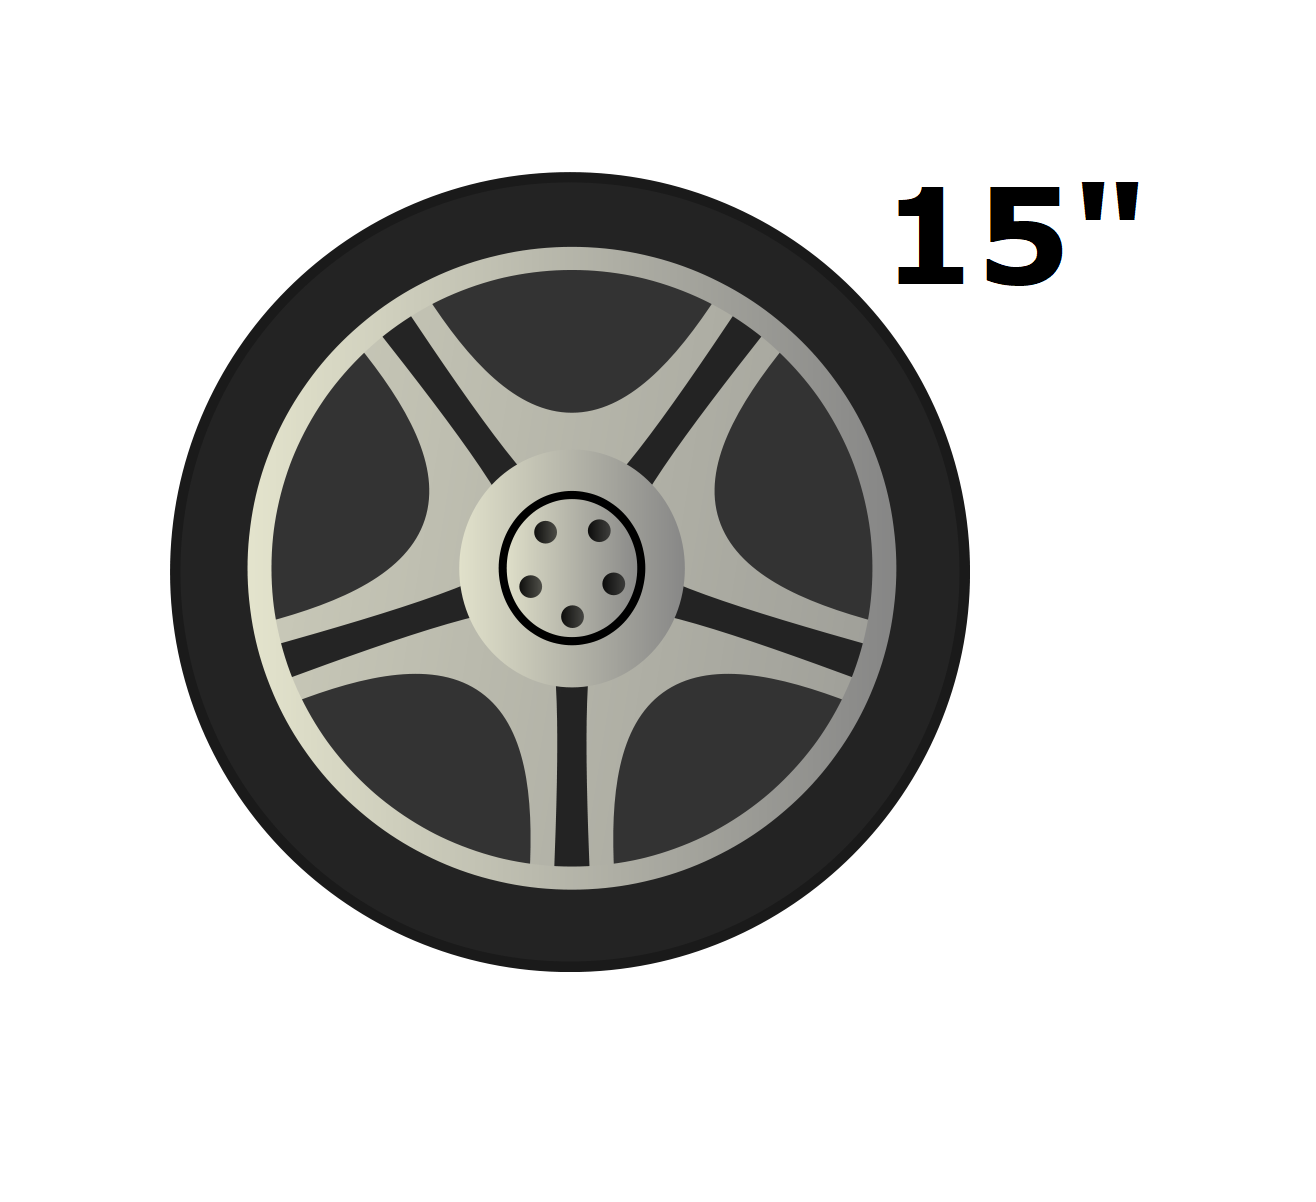 "15"" A1"